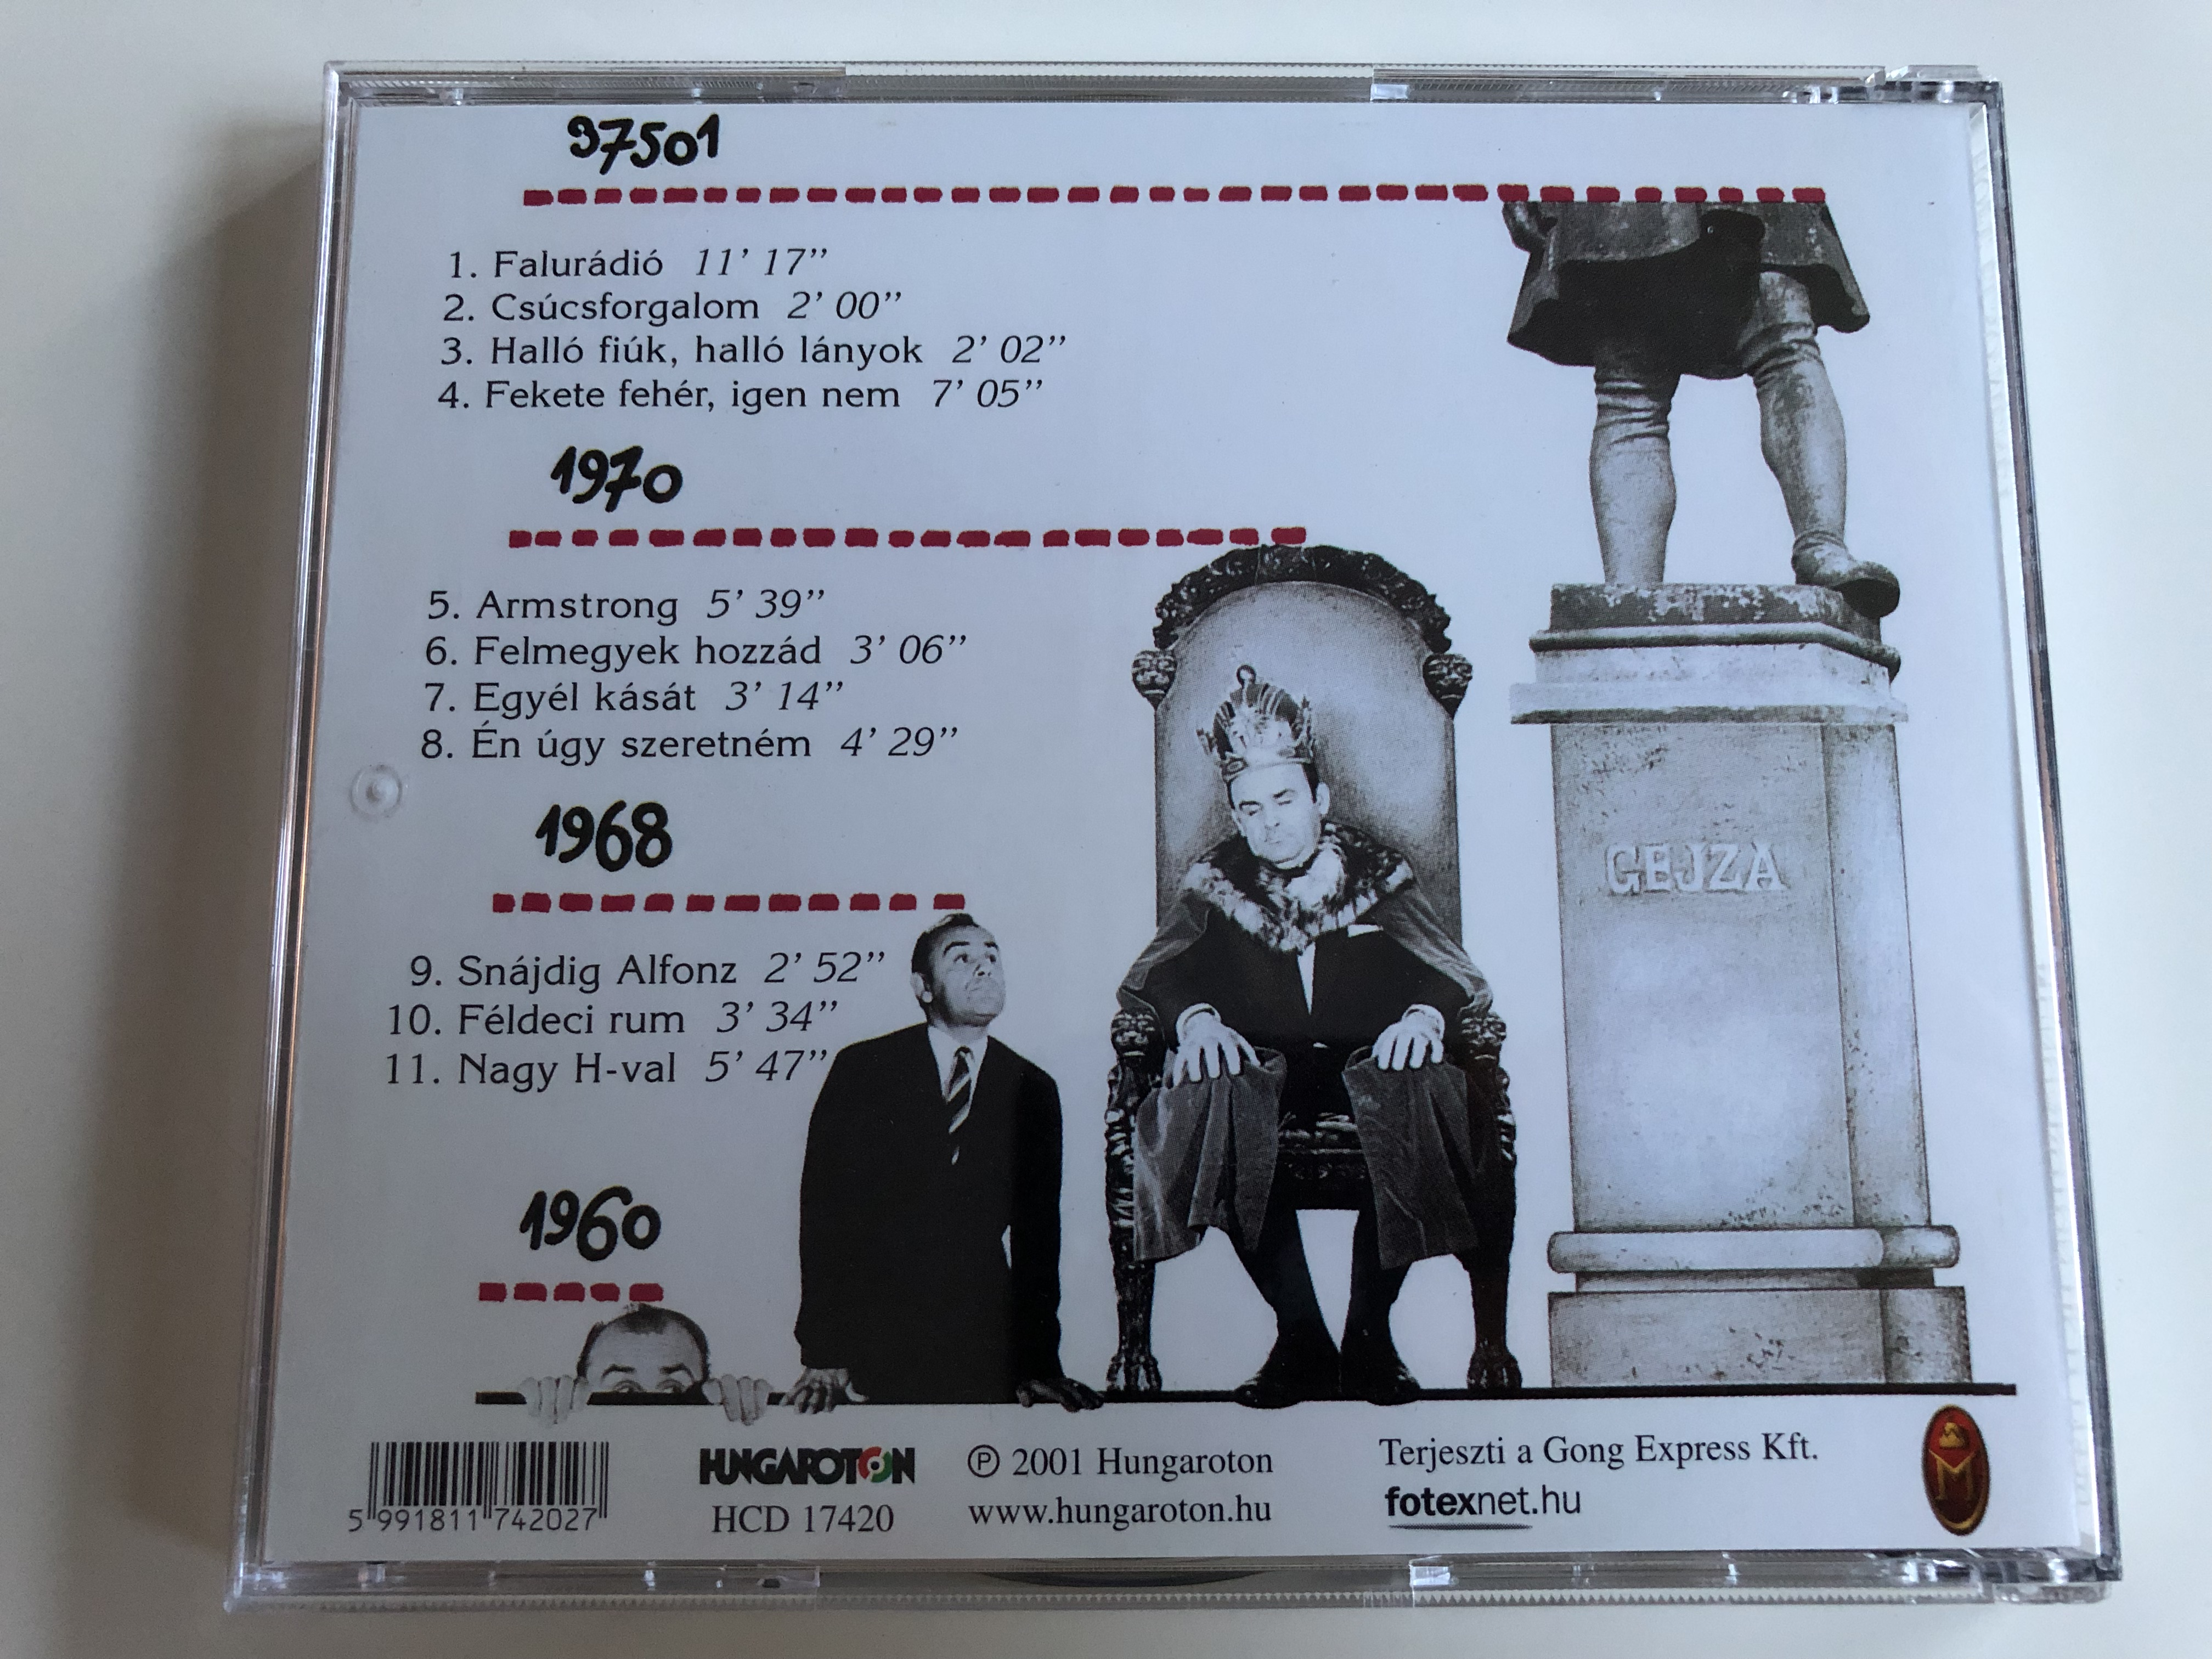 hofi-els-menet-audio-cd-2001-hungaroton-hcd-17420-hungarian-stand-up-comedy-show-with-g-za-hofi-5-.jpg